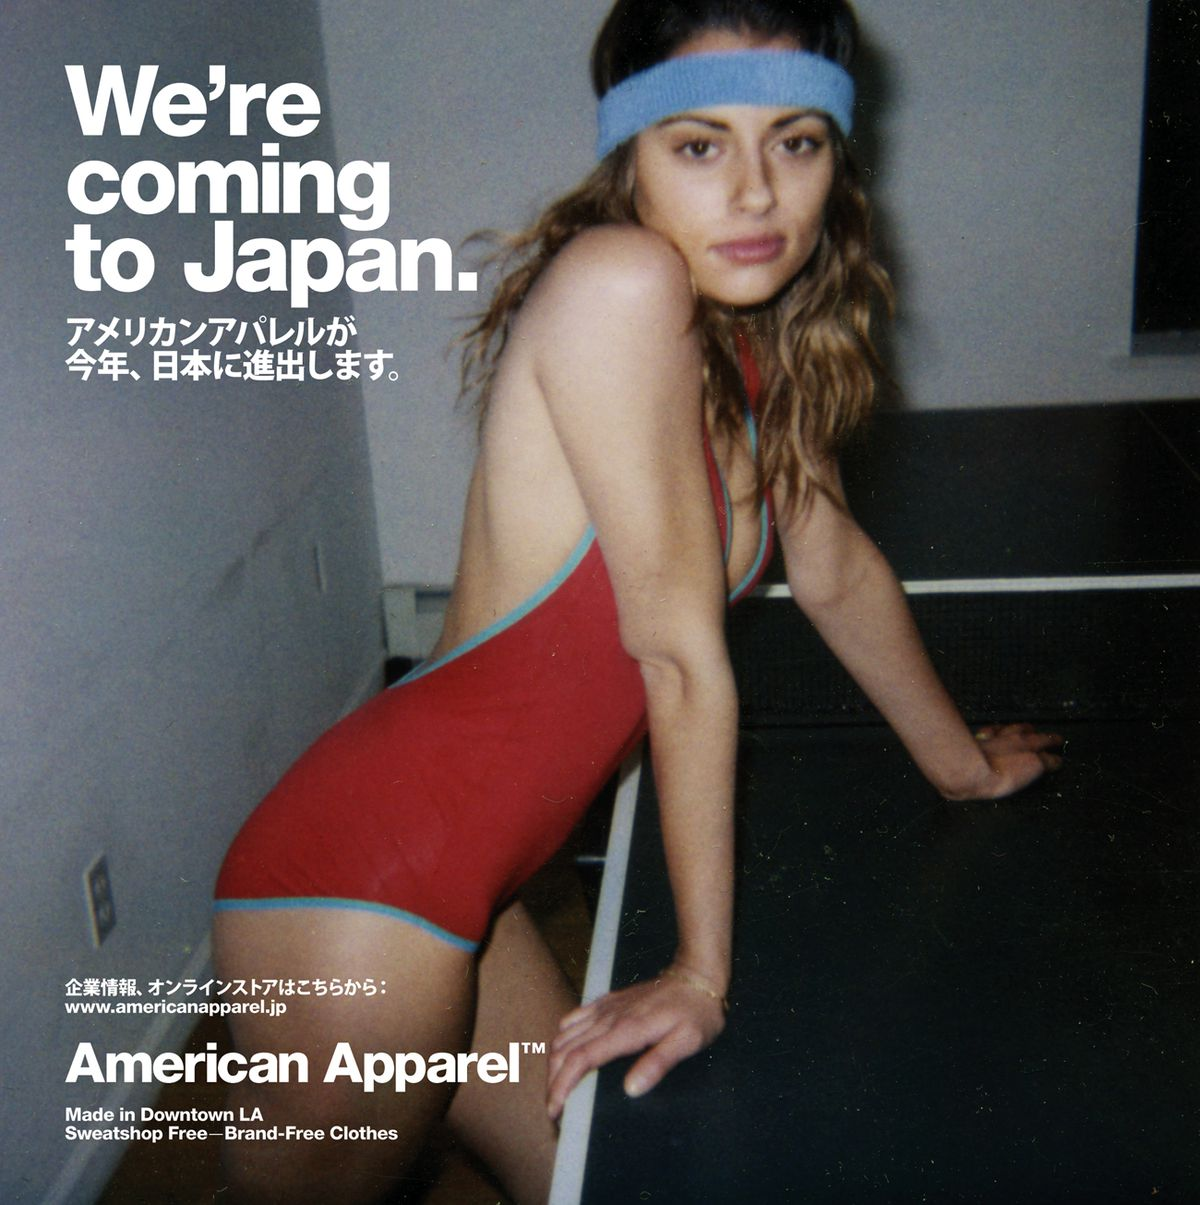 american-apparel-japan_2015_06.JPG